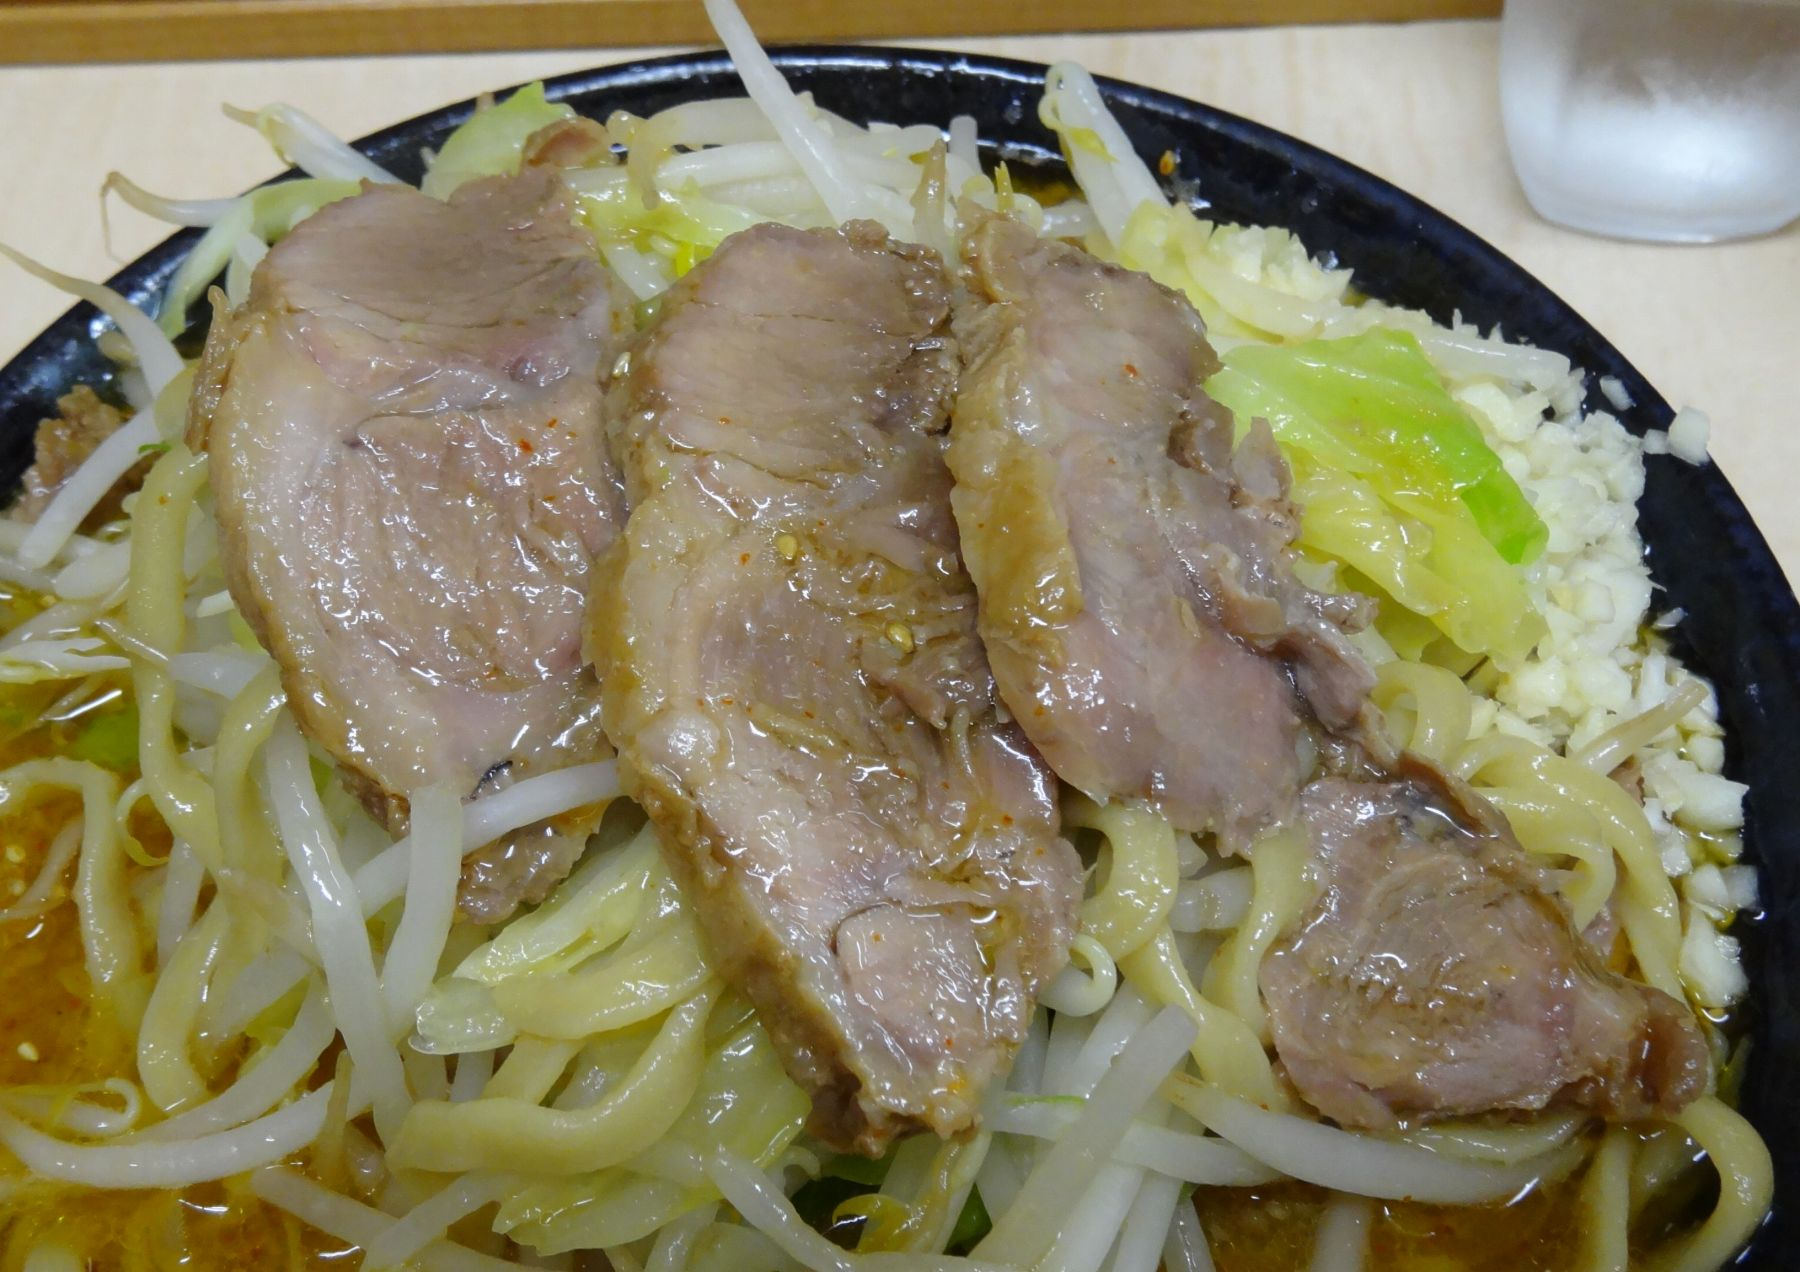 20121107003ookubo.jpg